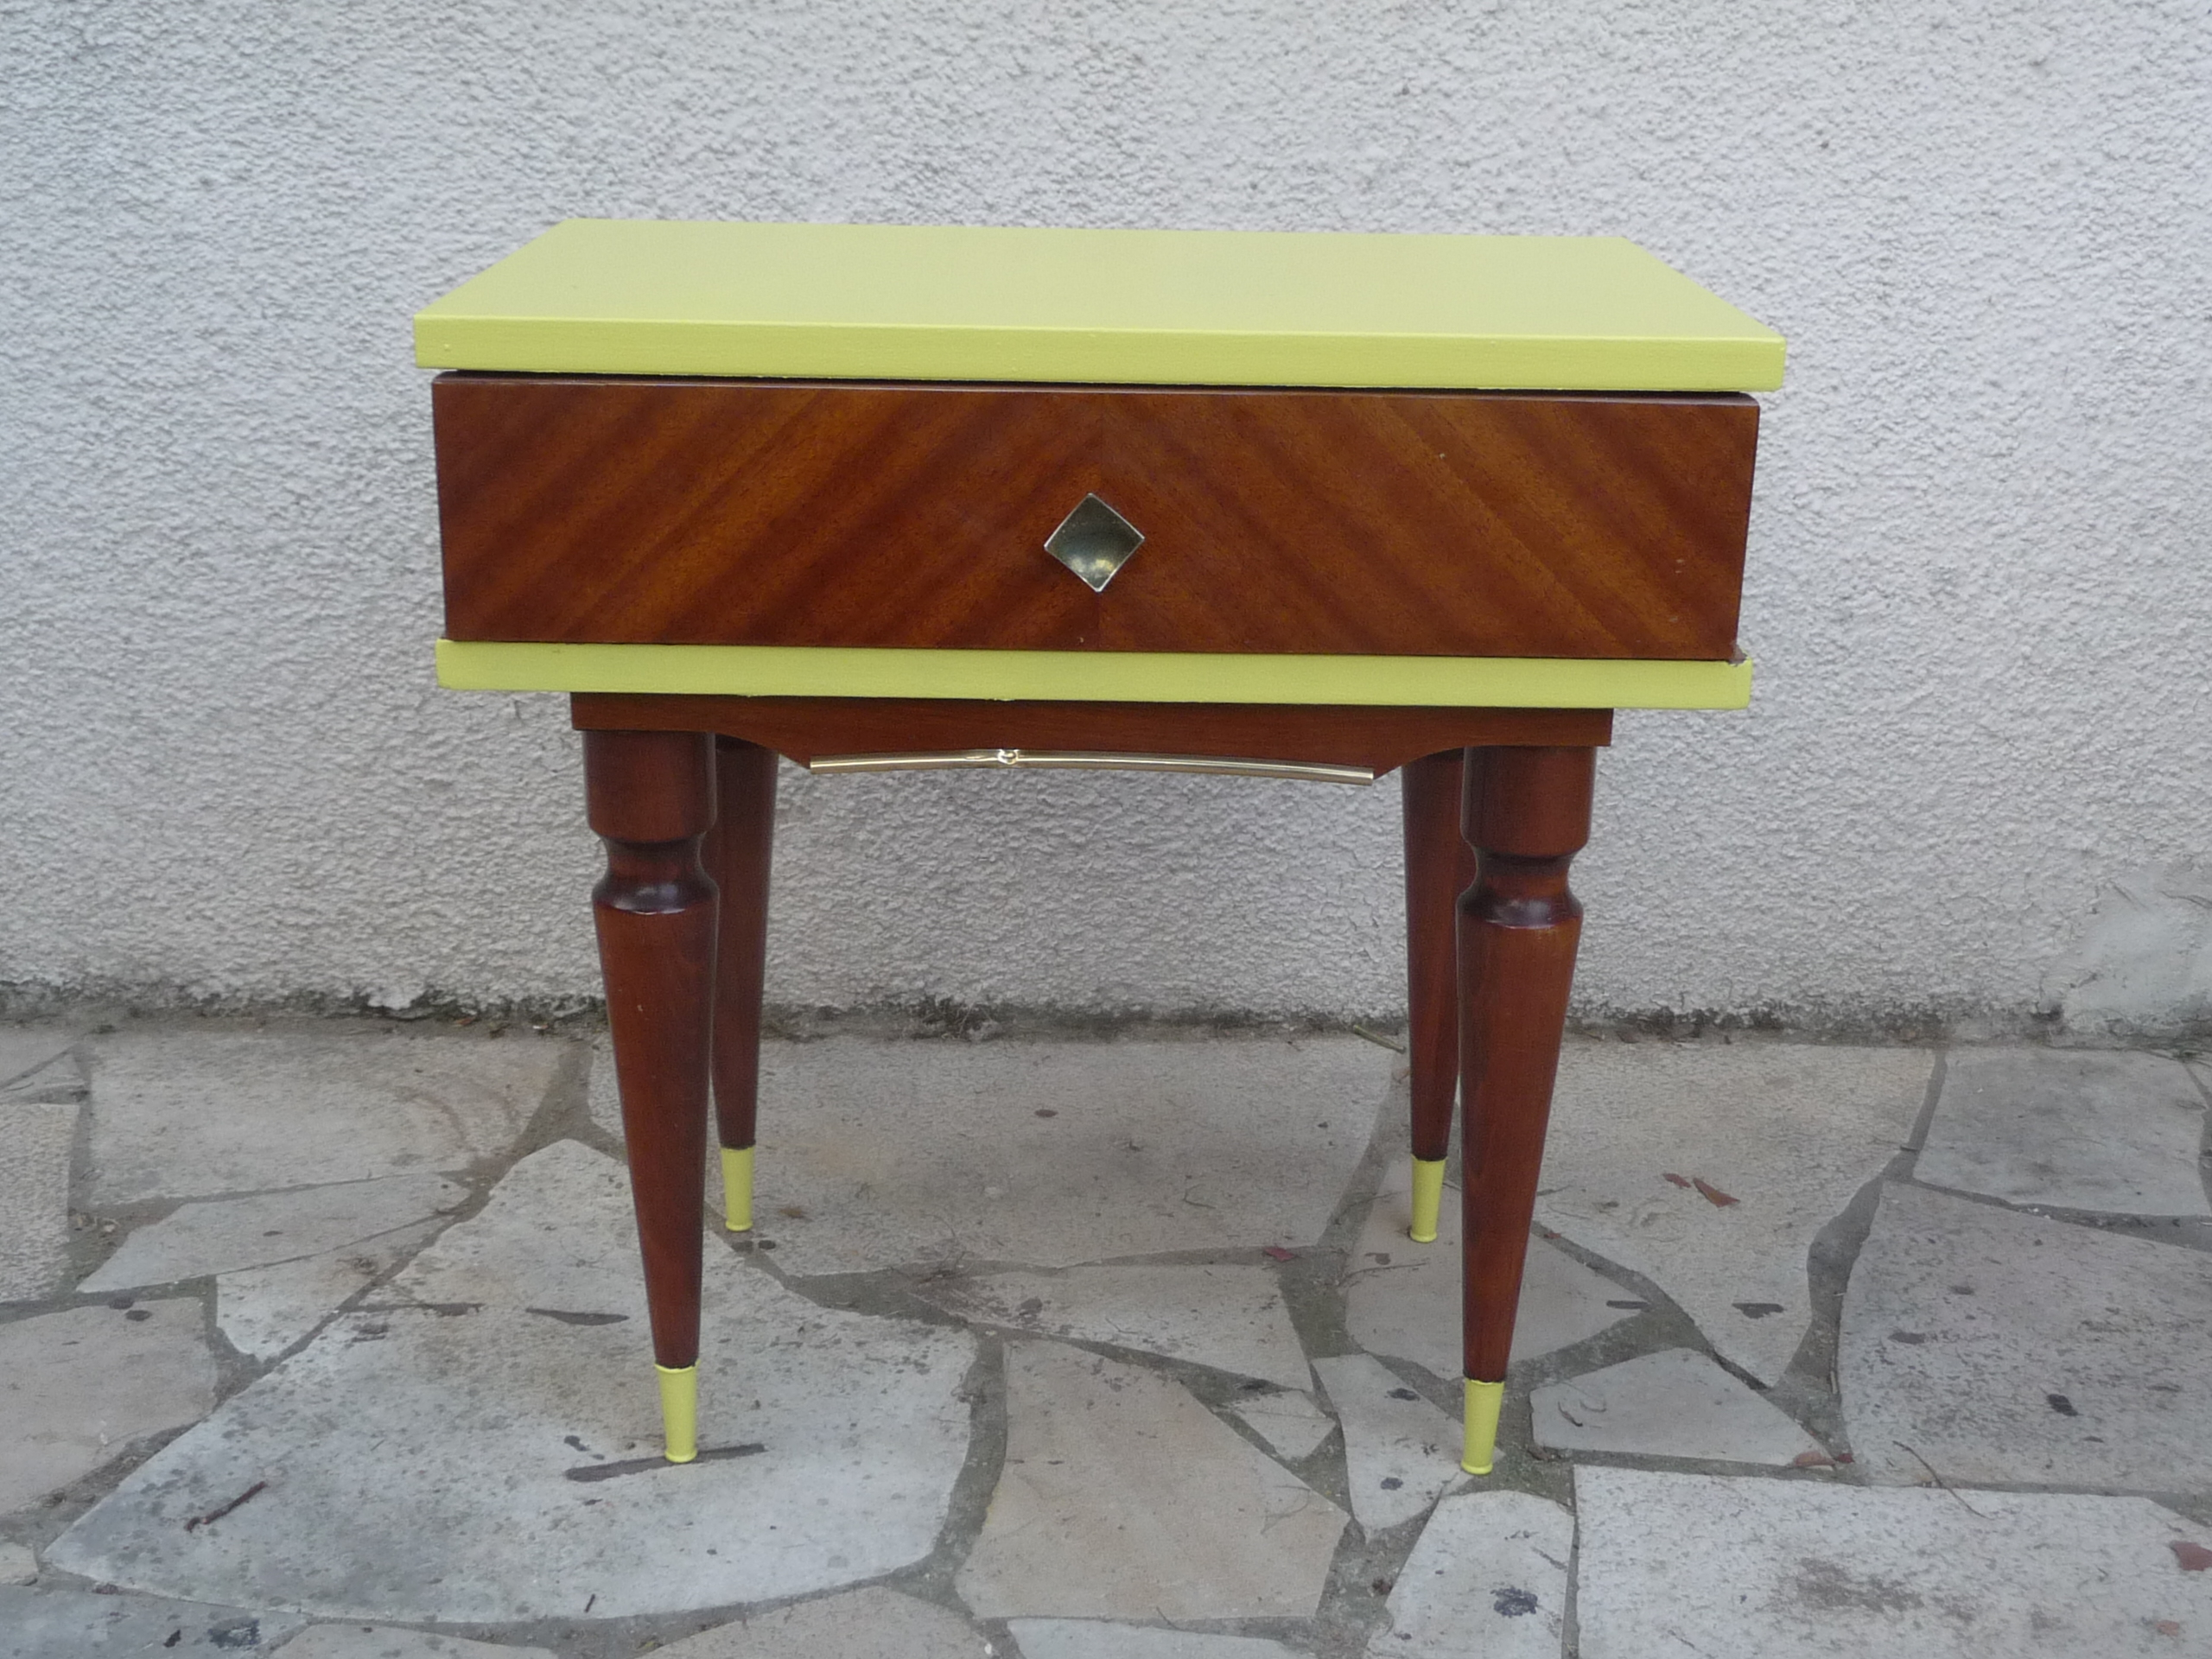 Table de chevet ann e 60 en mode fluo - Table de chevet jaune ...